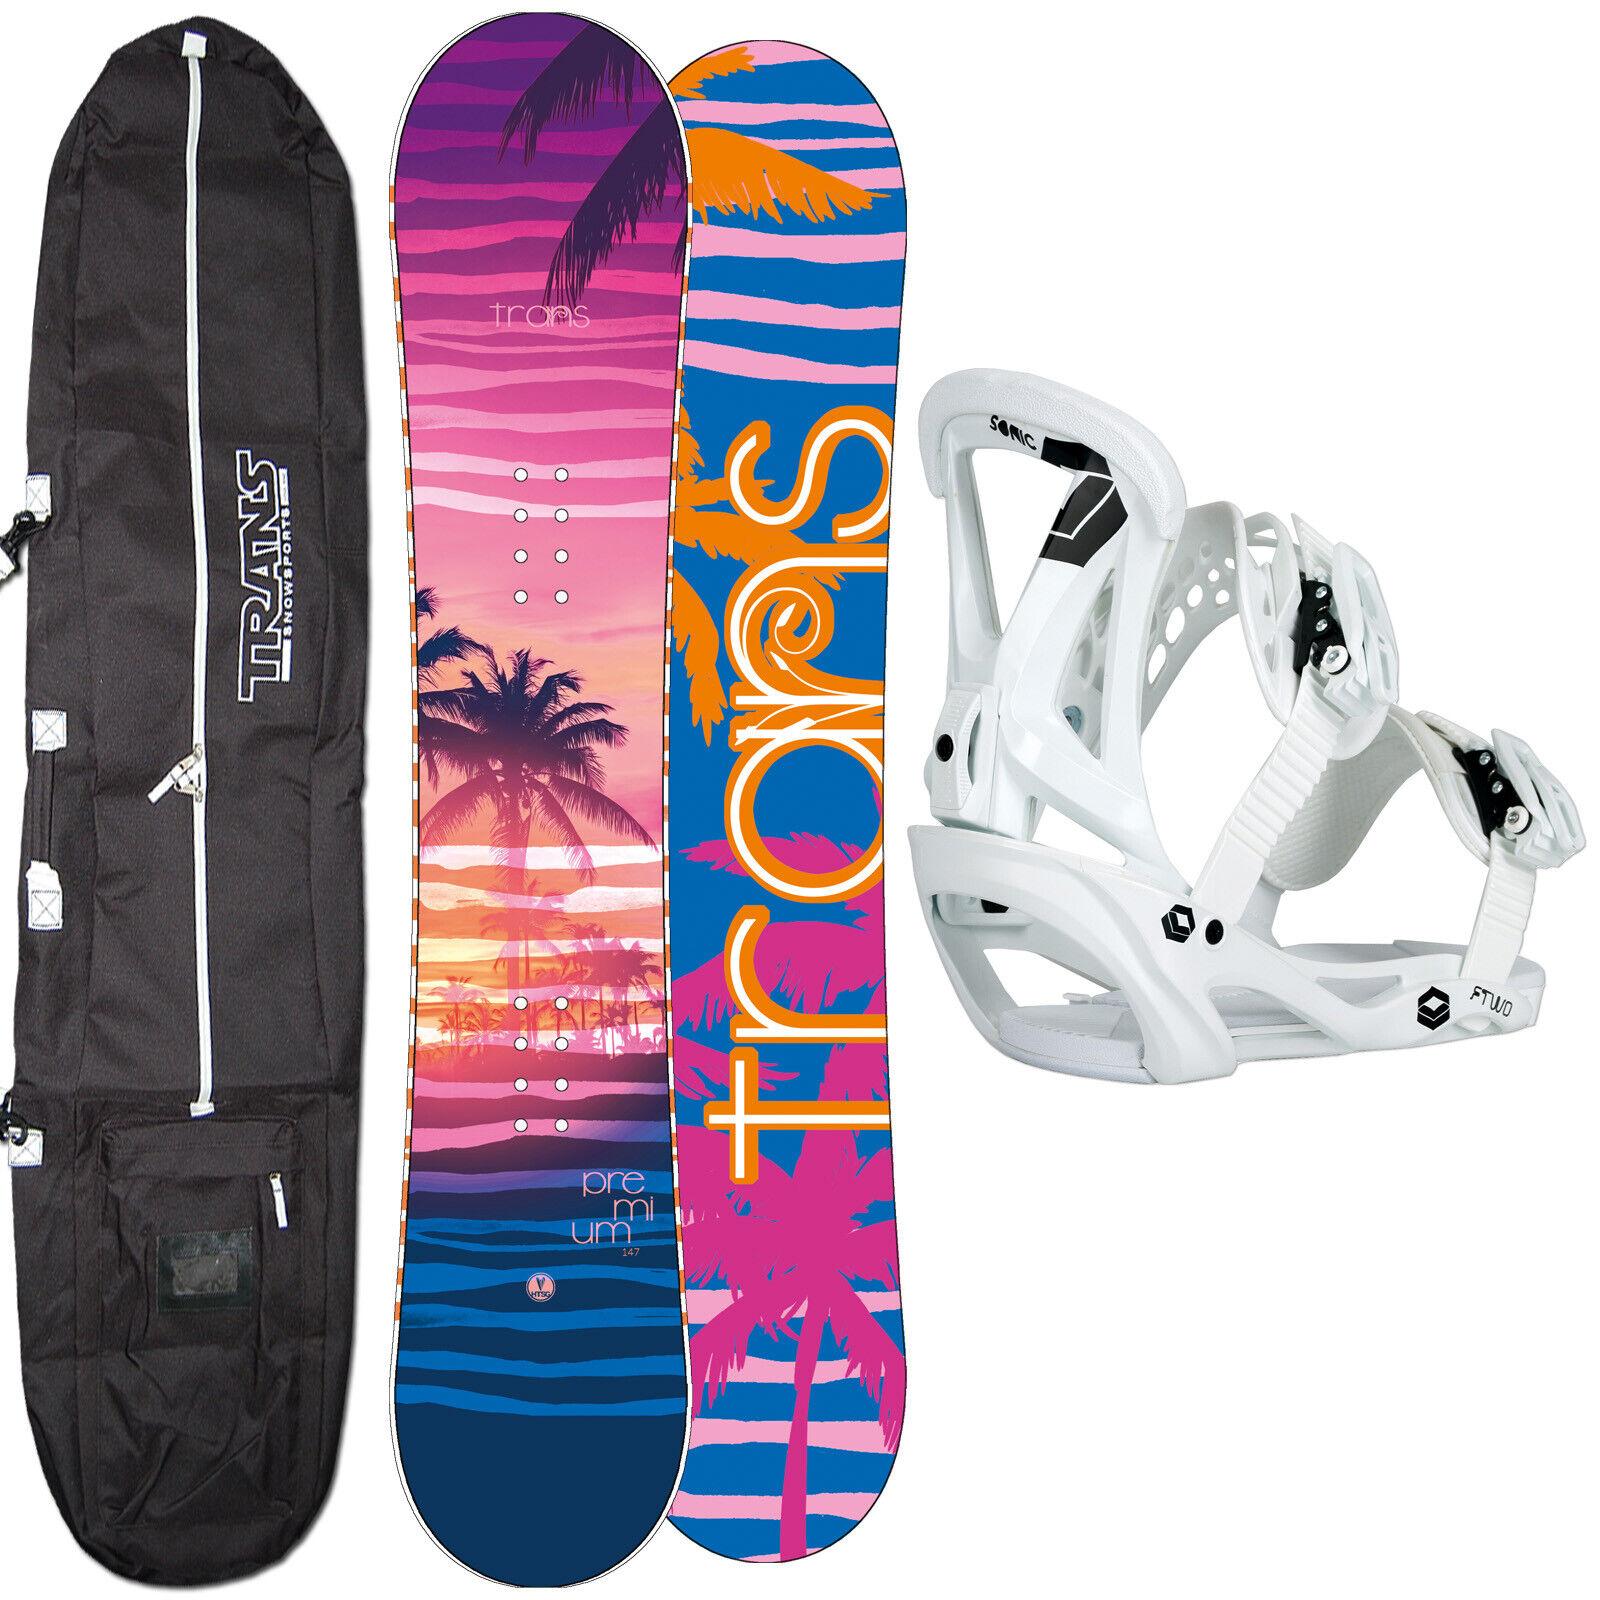 DAMEN SNOWBOARD SET TRANS PREMIUM 155 CM 2020 + FTWO SONIC BINDUNG M + BAG